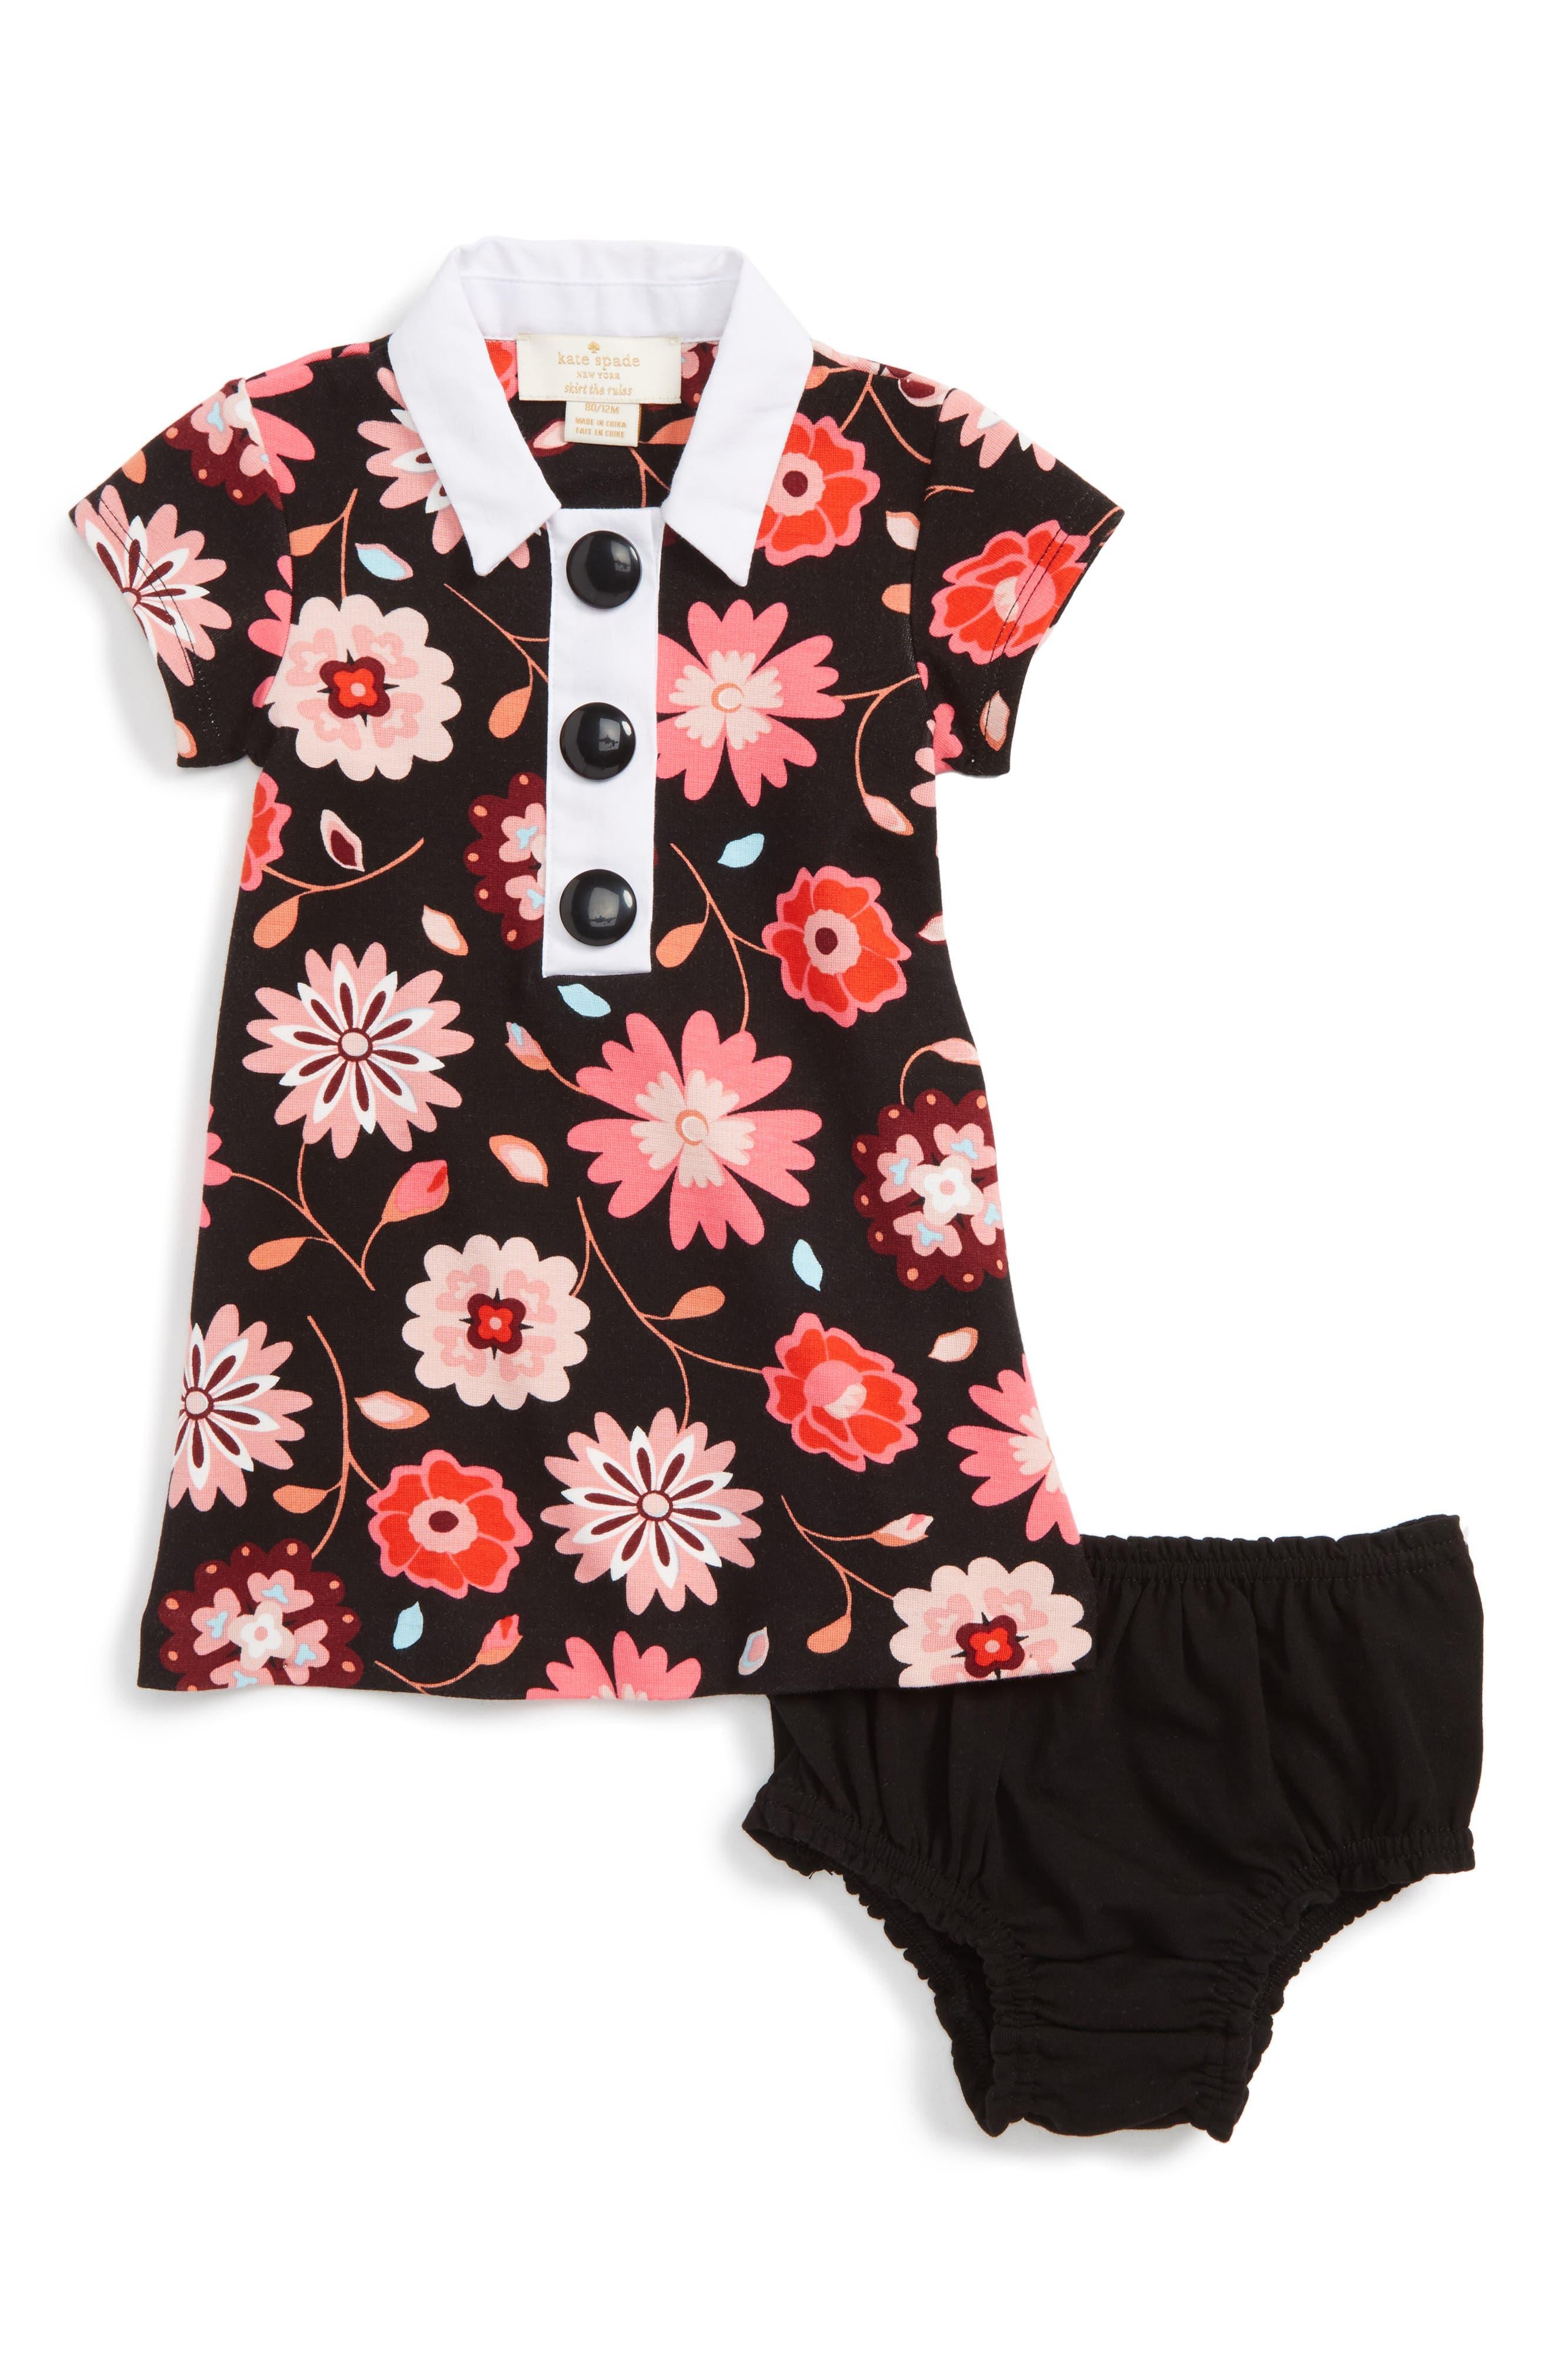 KATE SPADE NEW YORK collared shift dress